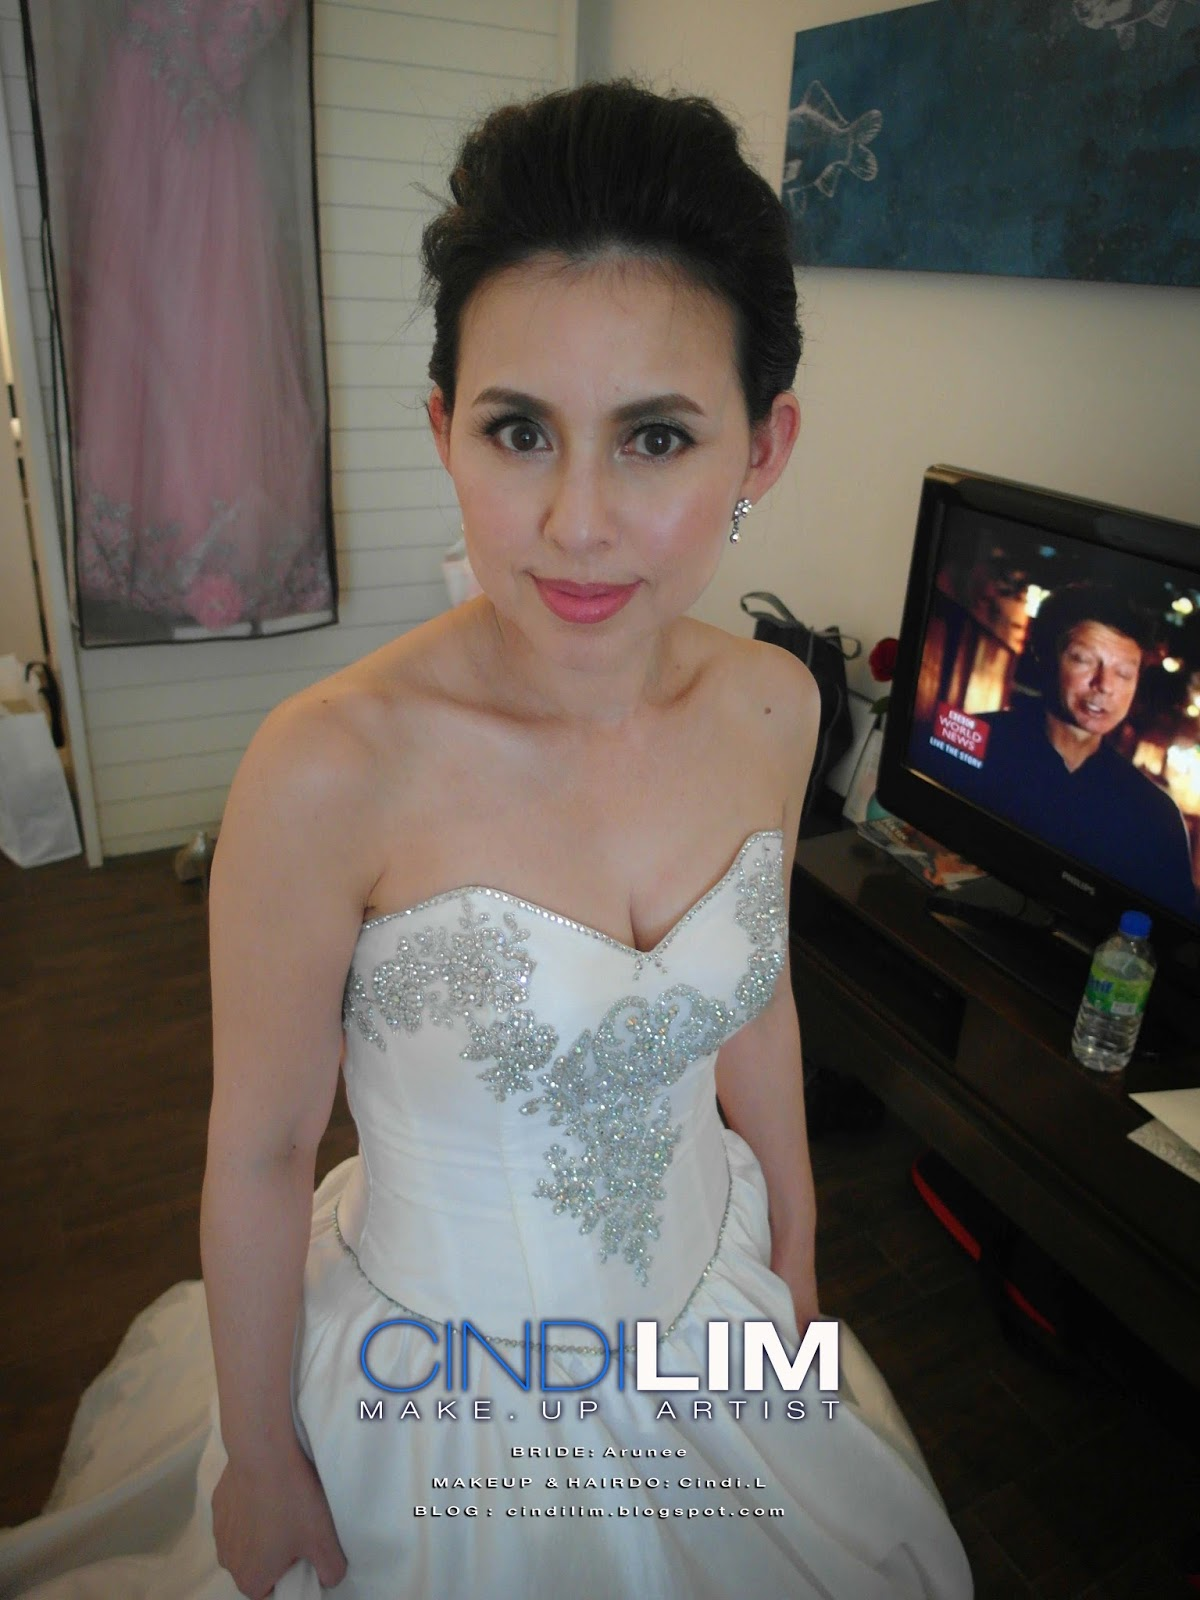 Cindi Pro Makeup Artist Commercial Photoshoot Makeup: :: Cindi Pro. Makeup Artist ::: Wedding Bride : Makeup